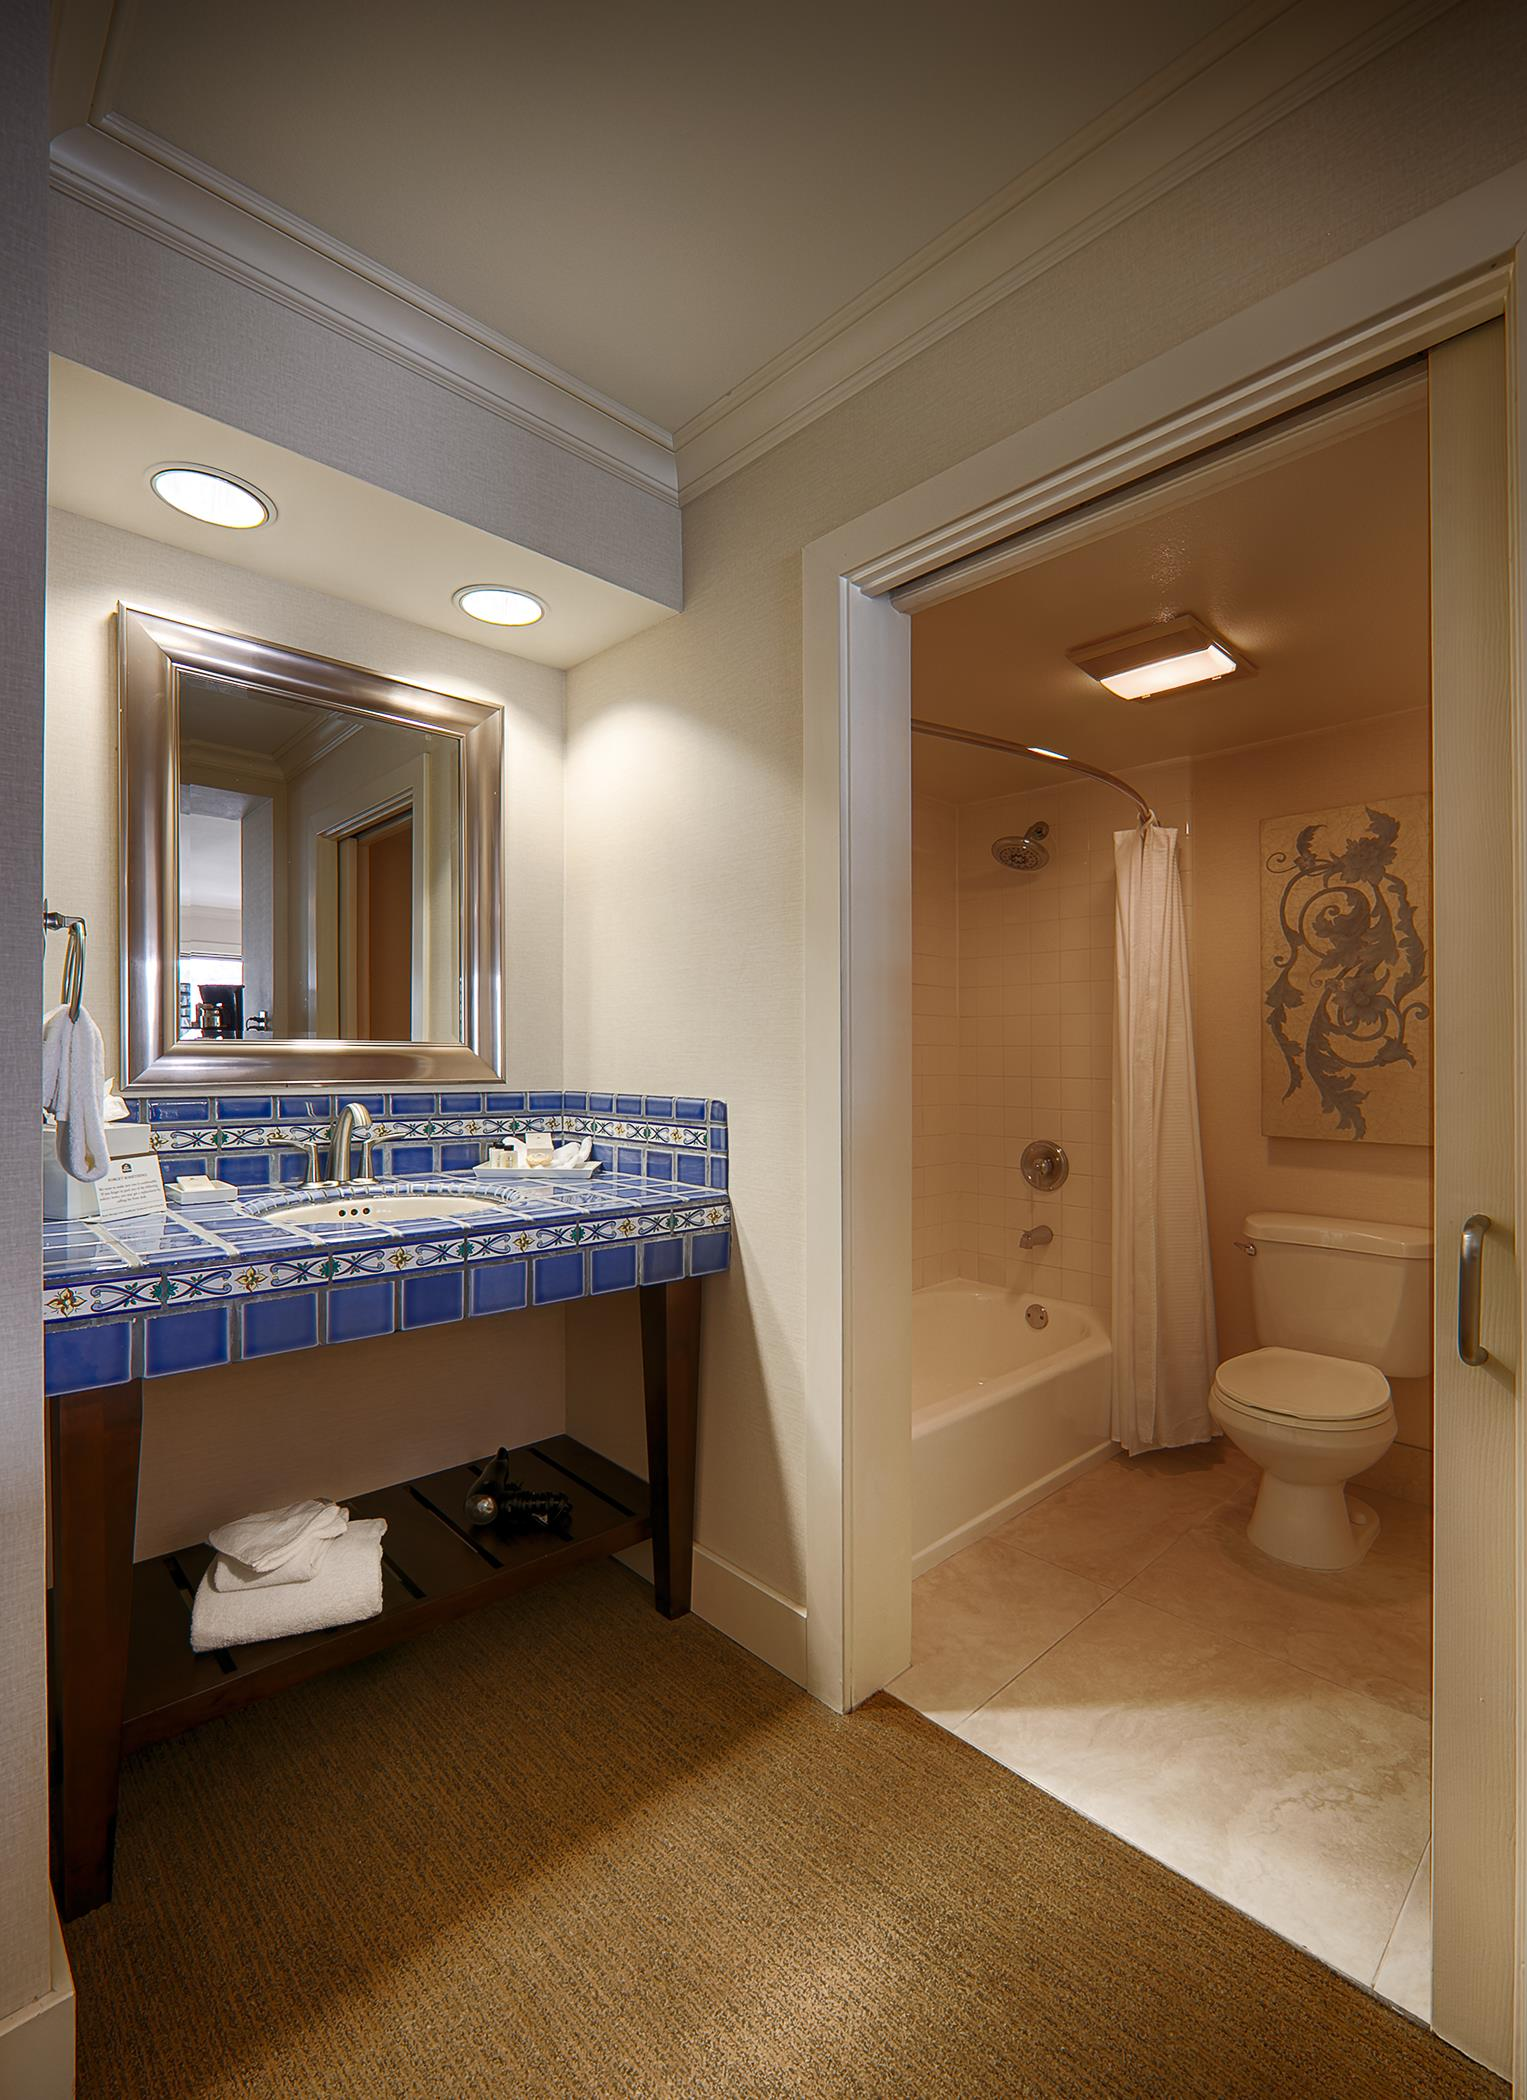 Best Western Plus Island Palms Hotel & Marina image 20